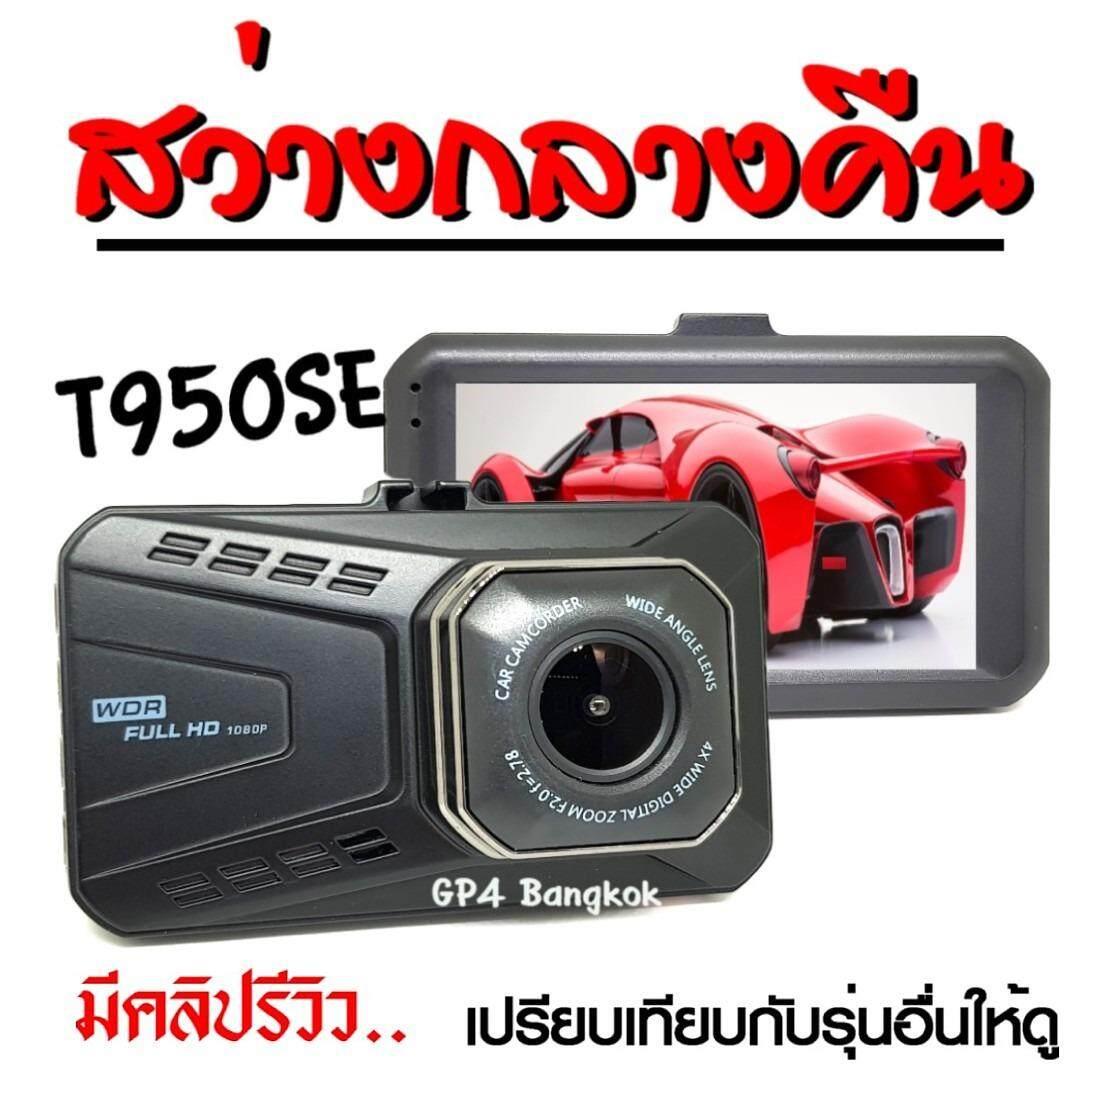 GP4 กล้องติดรถยนต์ สว่างกลางคืน WDR และ Parking Monitor บอดี้โลหะ FHD 1080P จอใหญ่ 3.0นิ้ว เมนูไทย รุ่น T950SE -Black ( มีคลิปวีดีโอ เปรียบเทียบกับรุ่นอื่น )